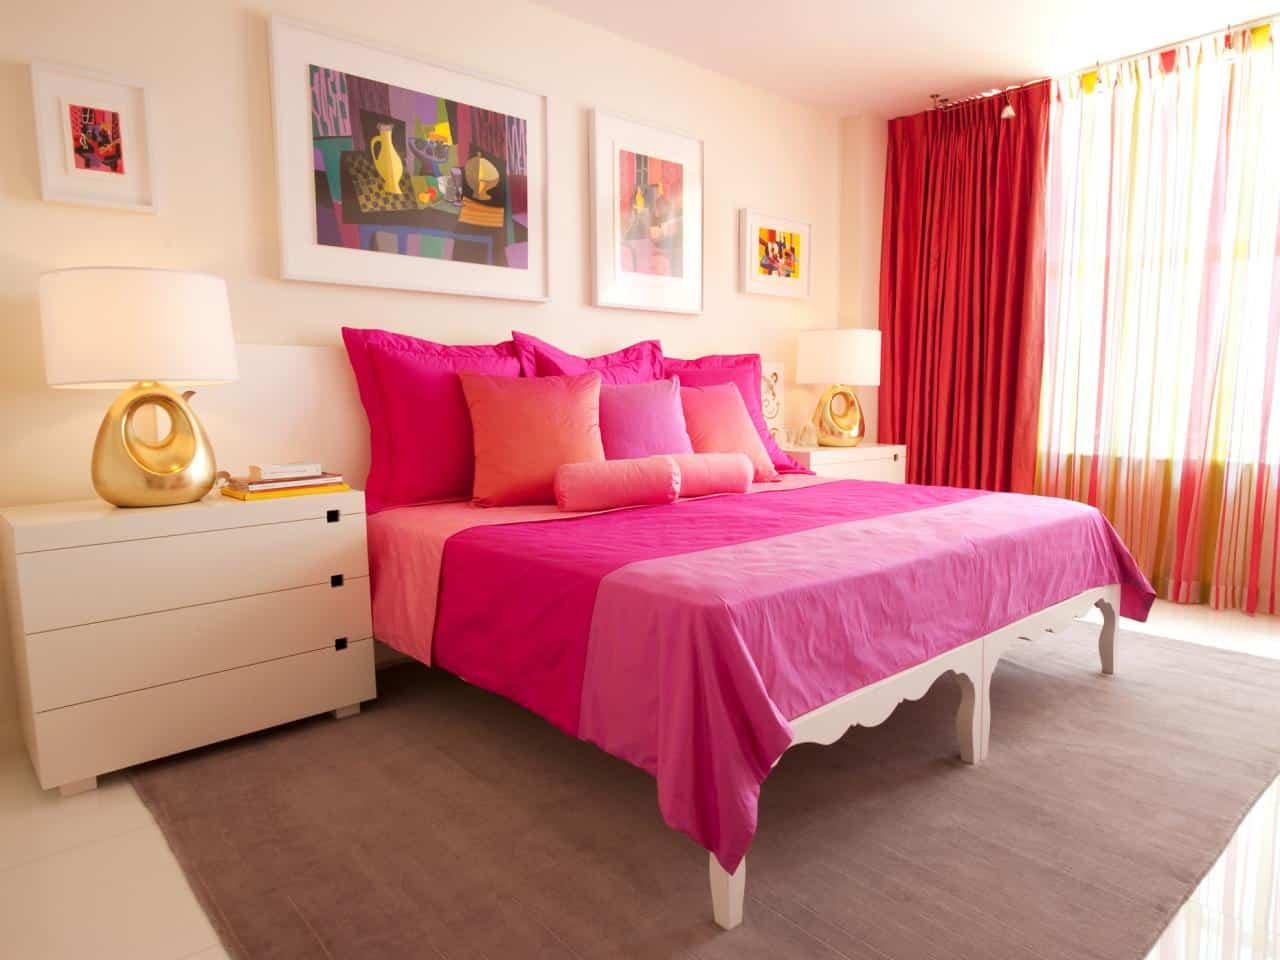 orange, hot pink and cream room